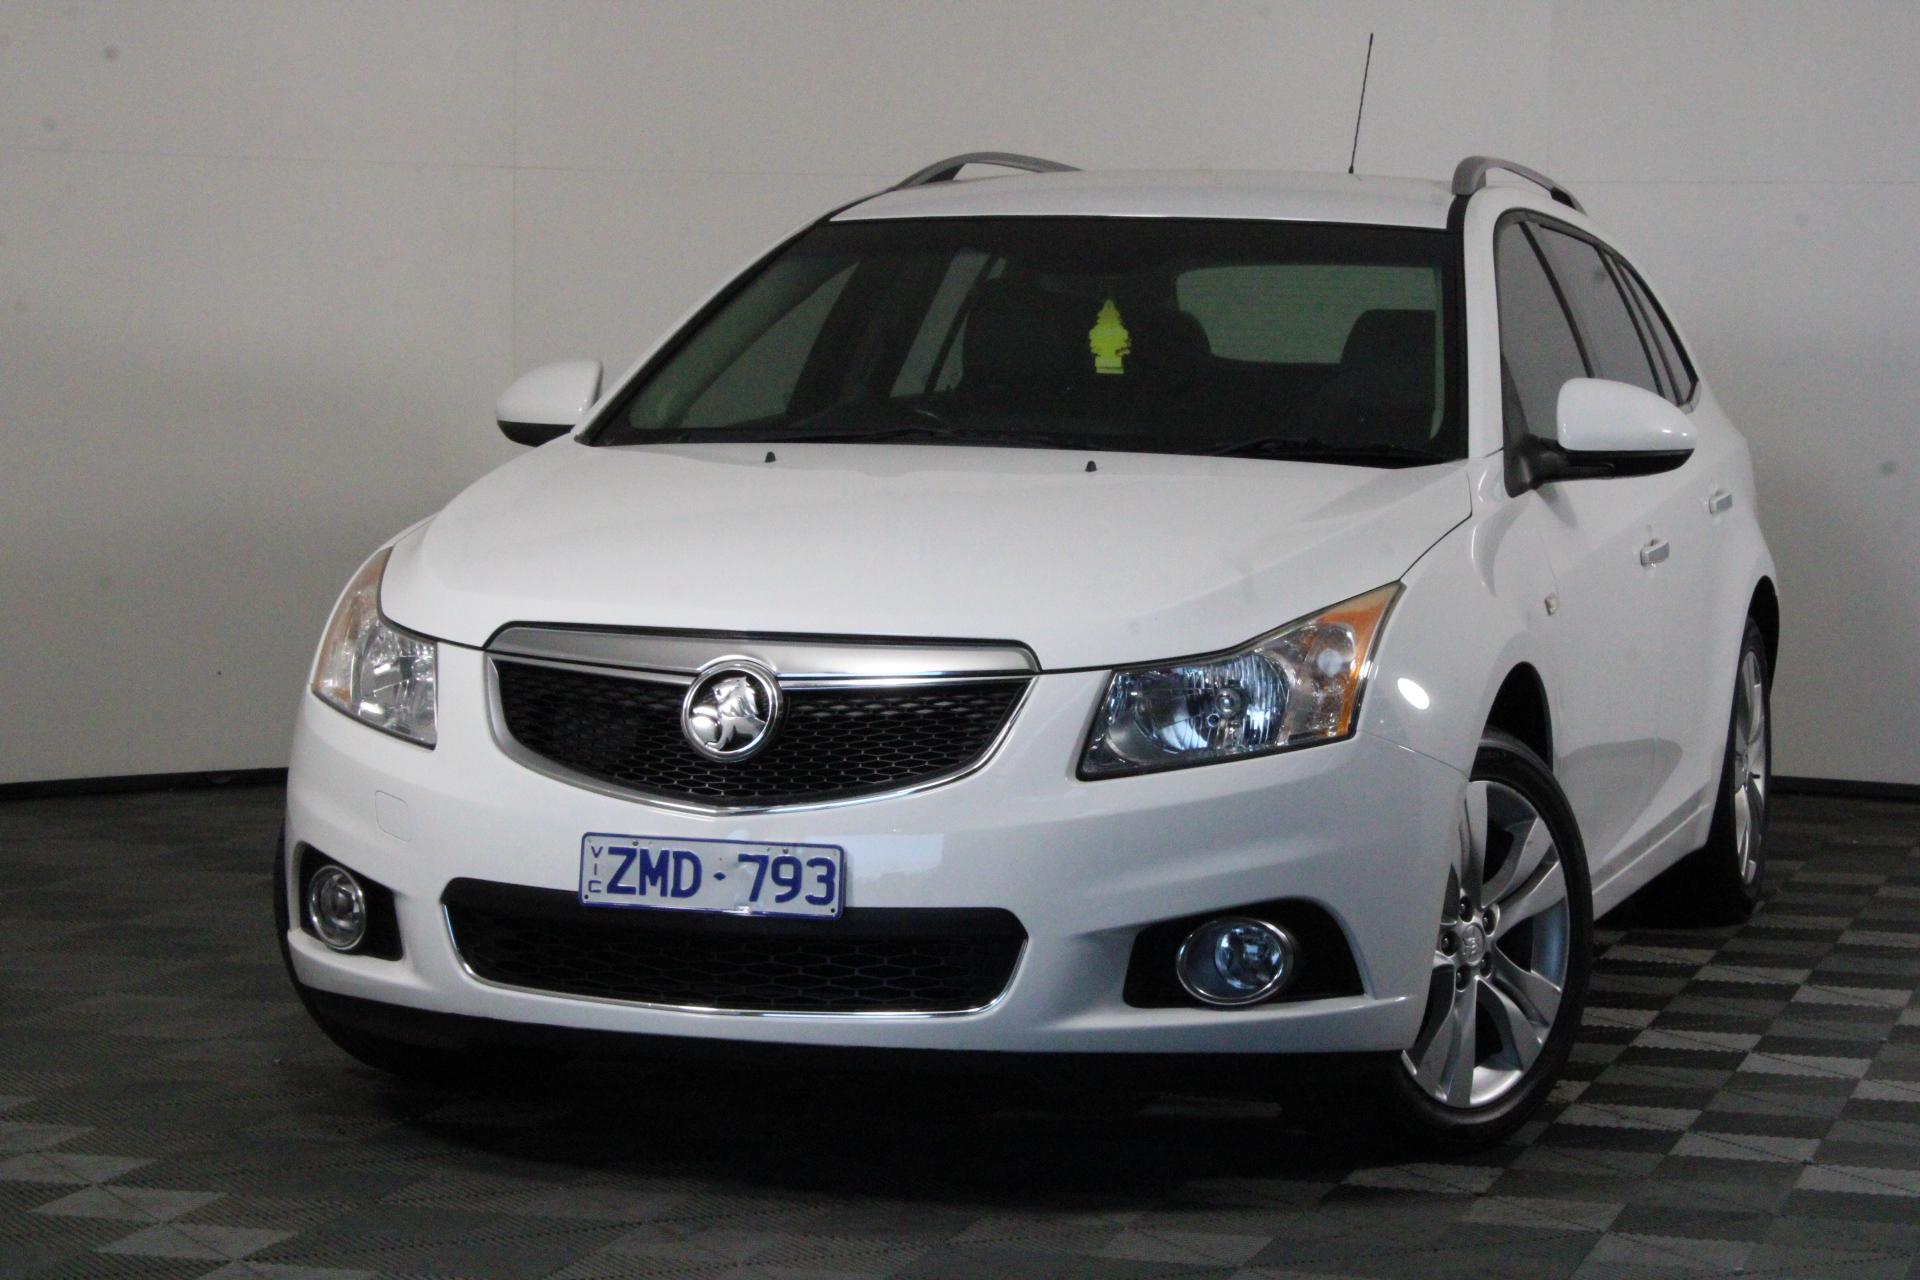 2013 Holden Cruze CDX SPORTWAGON JH Automatic Wagon